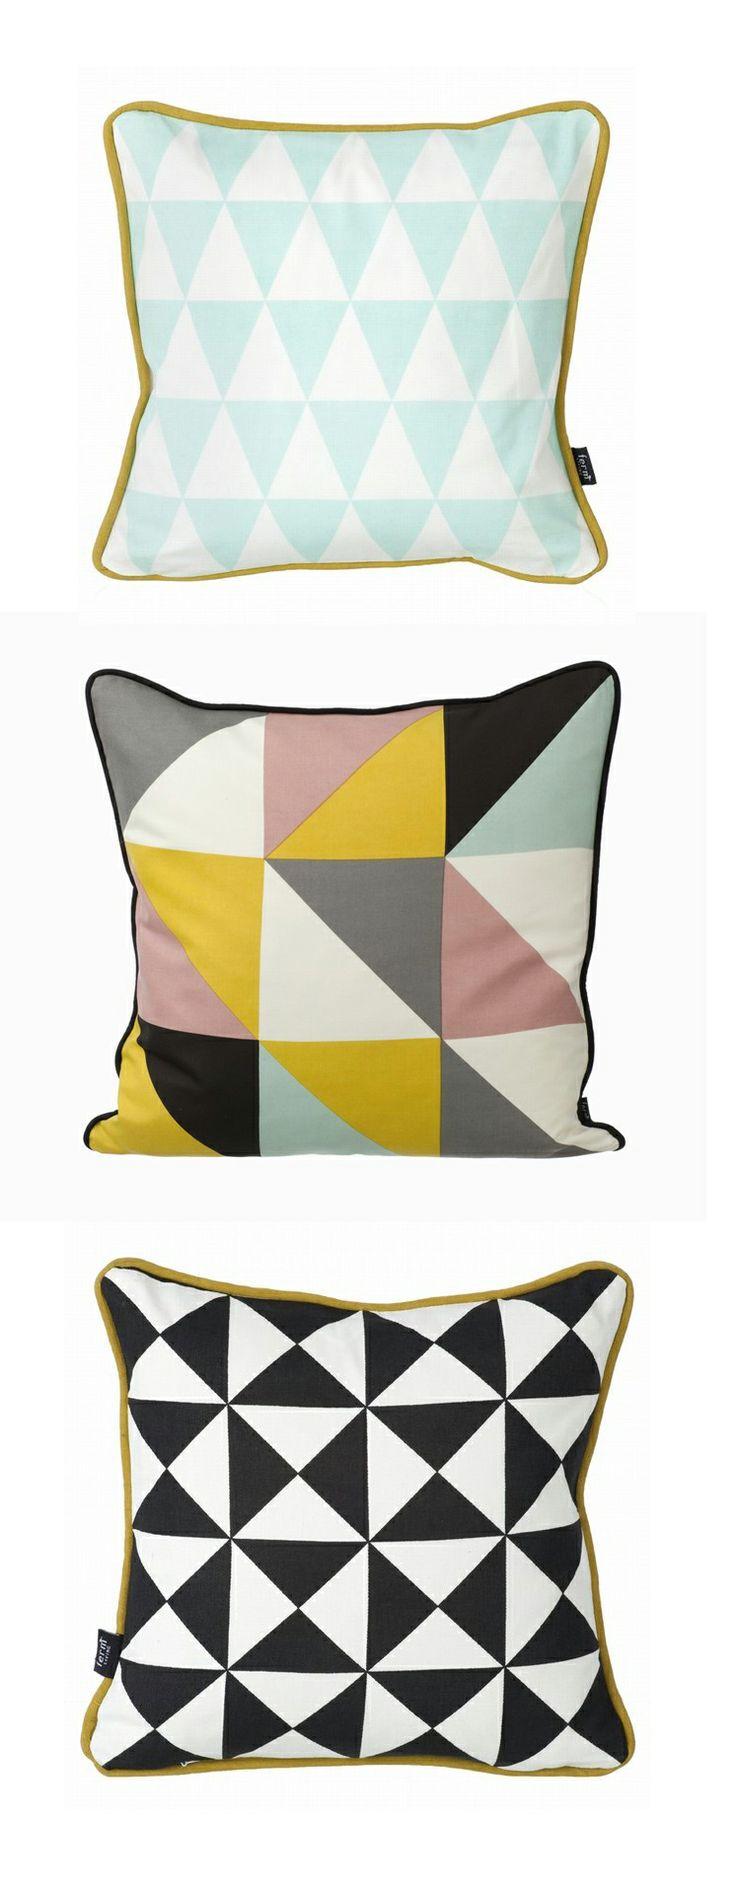 Geo pillows